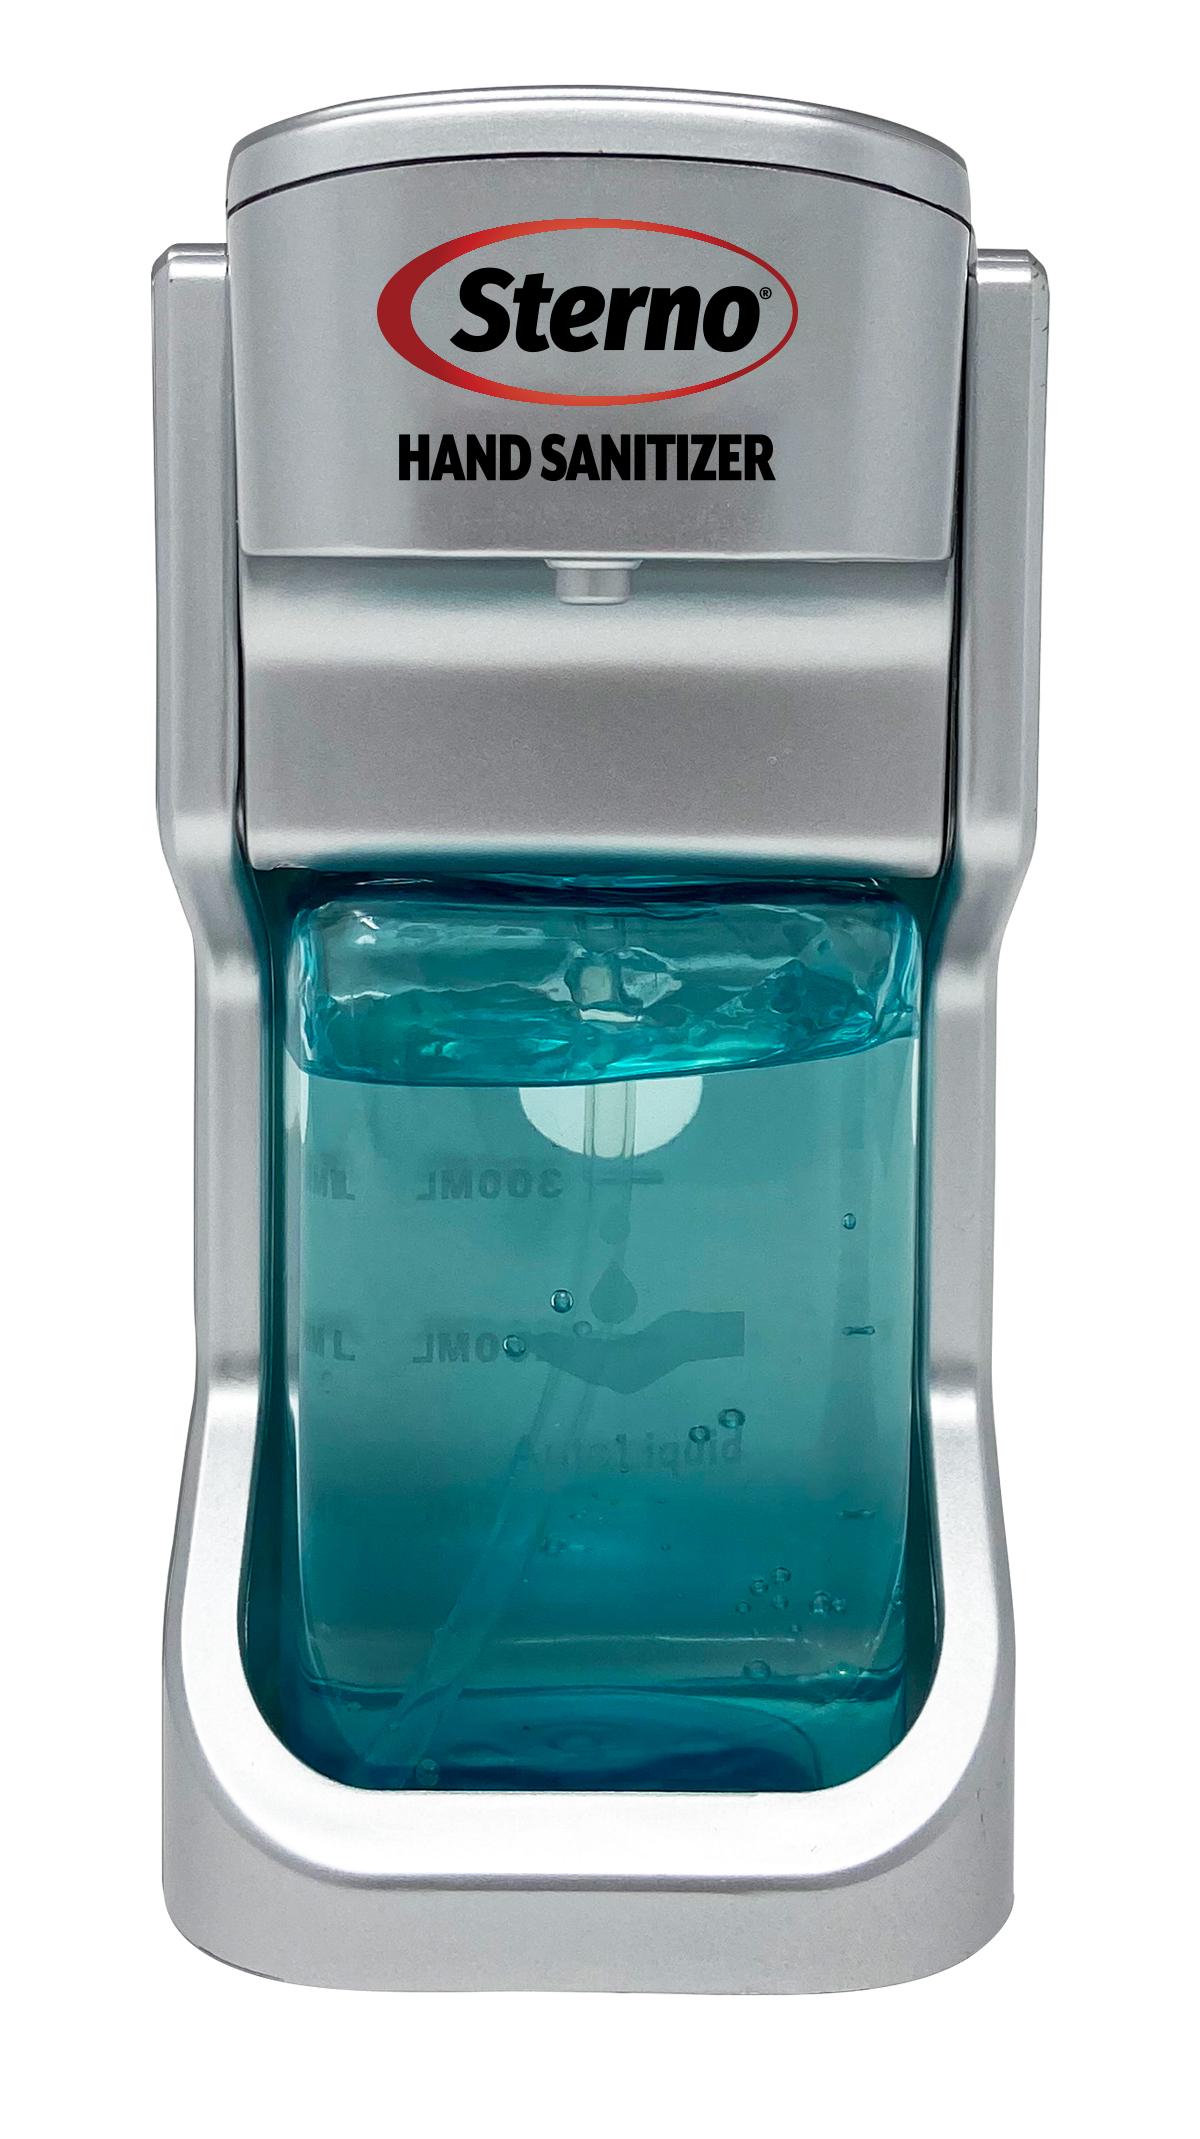 Sterno 70424 hand sanitizer dispenser